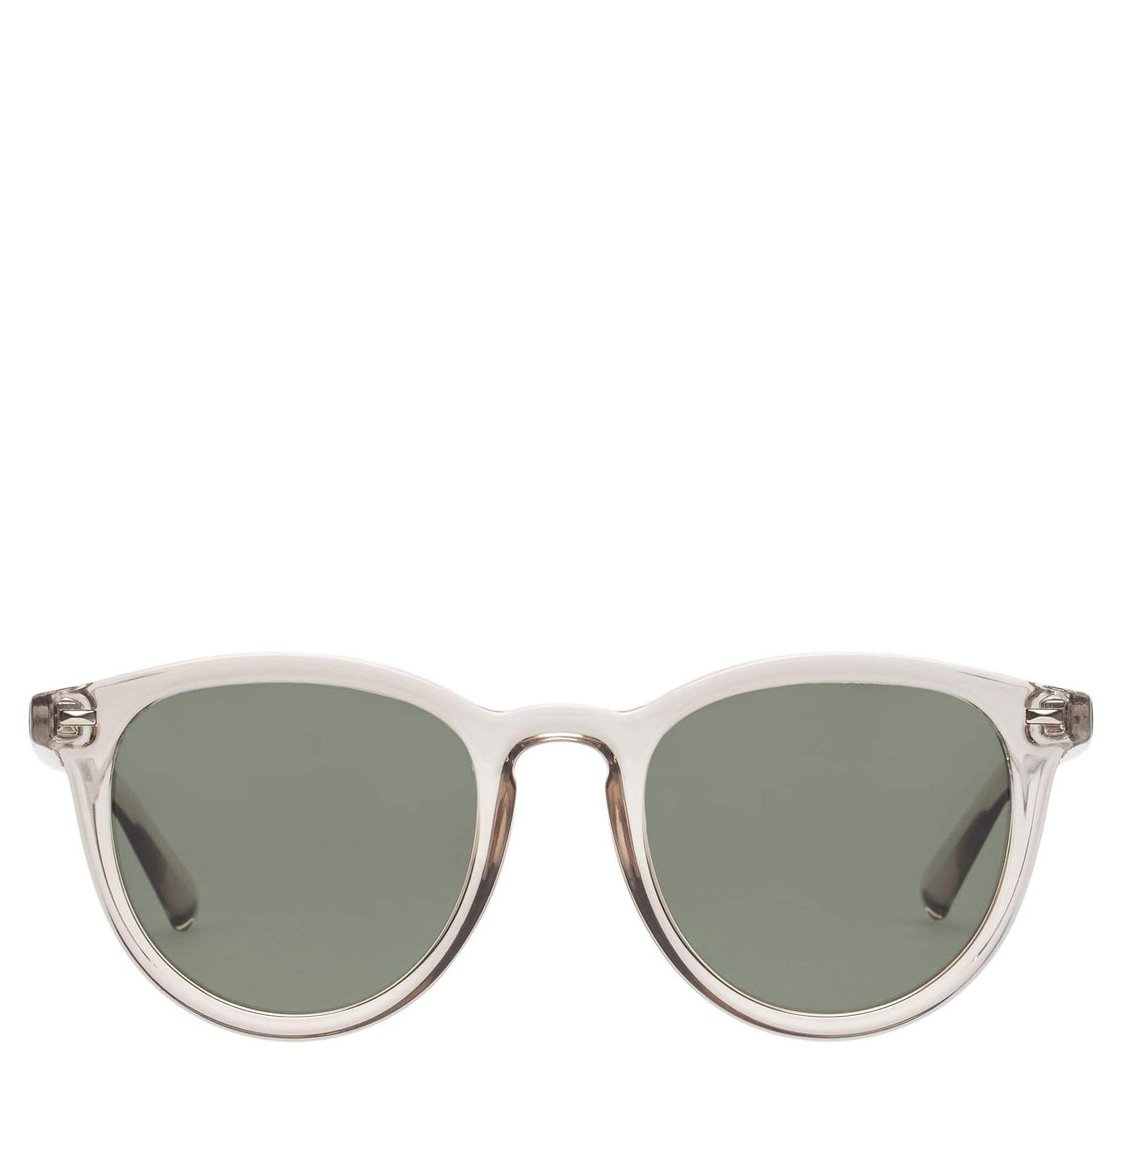 Le Specs Round Stone Polarised Γυαλιά Ηλίου